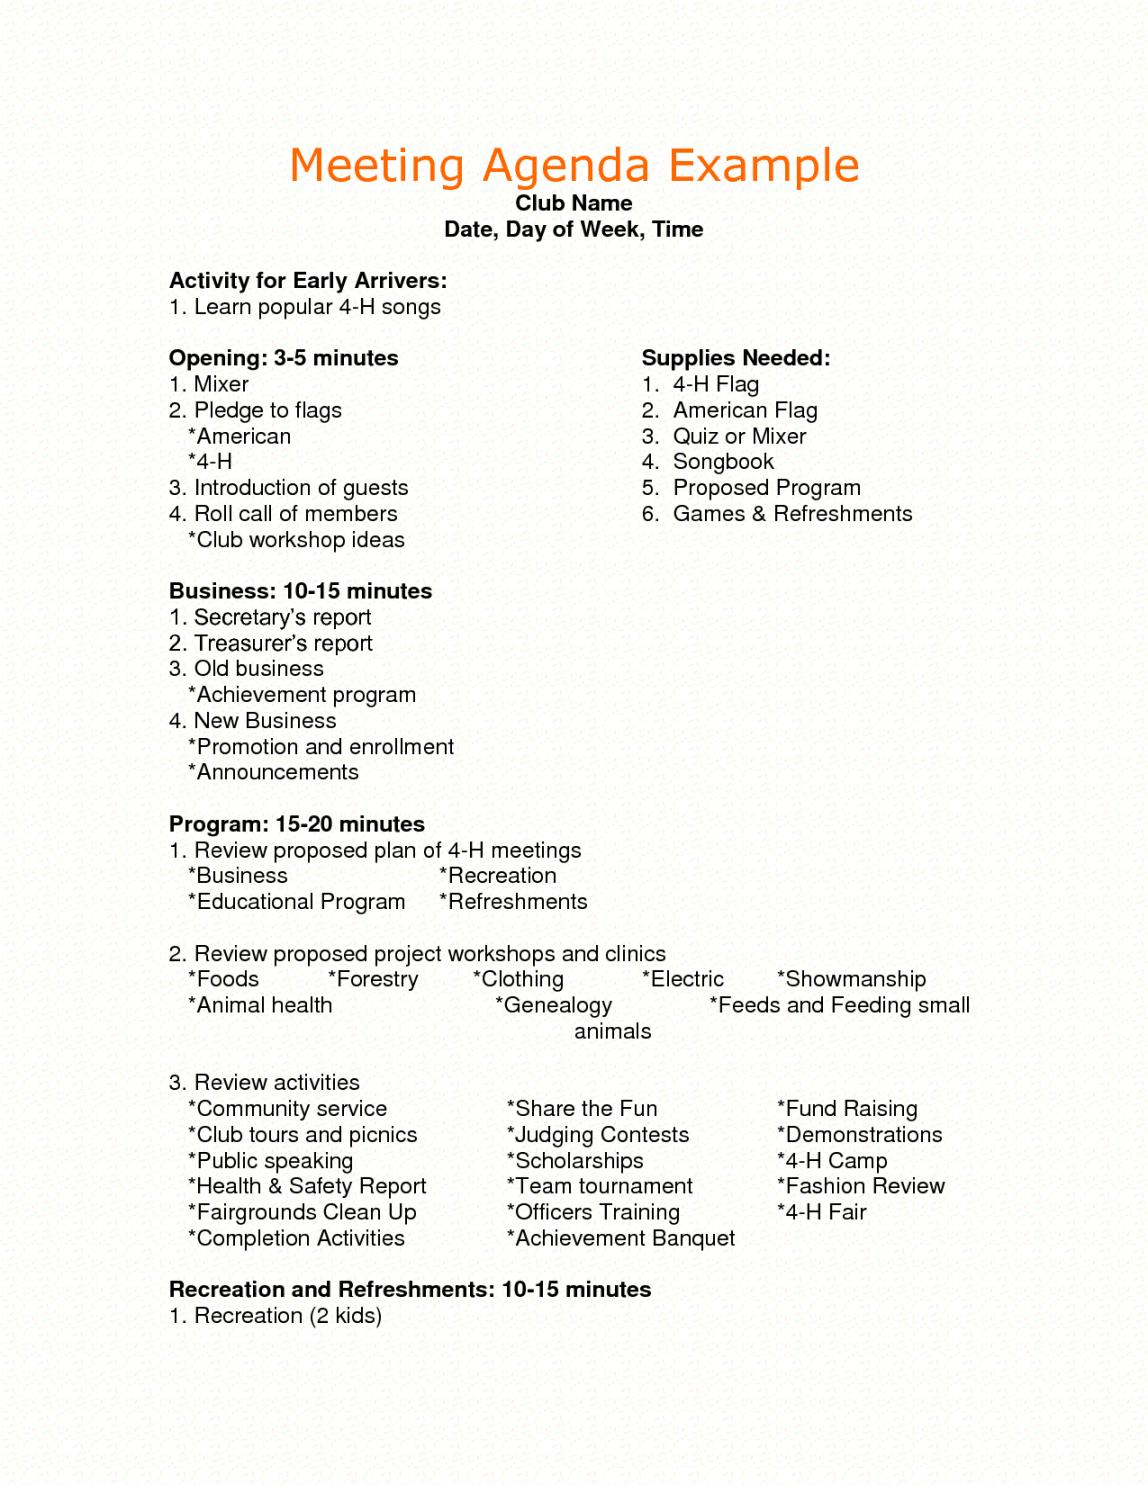 Free Sample Agenda For Business Meeting  Google Search  Agenda Small Business Meeting Agenda Template Word